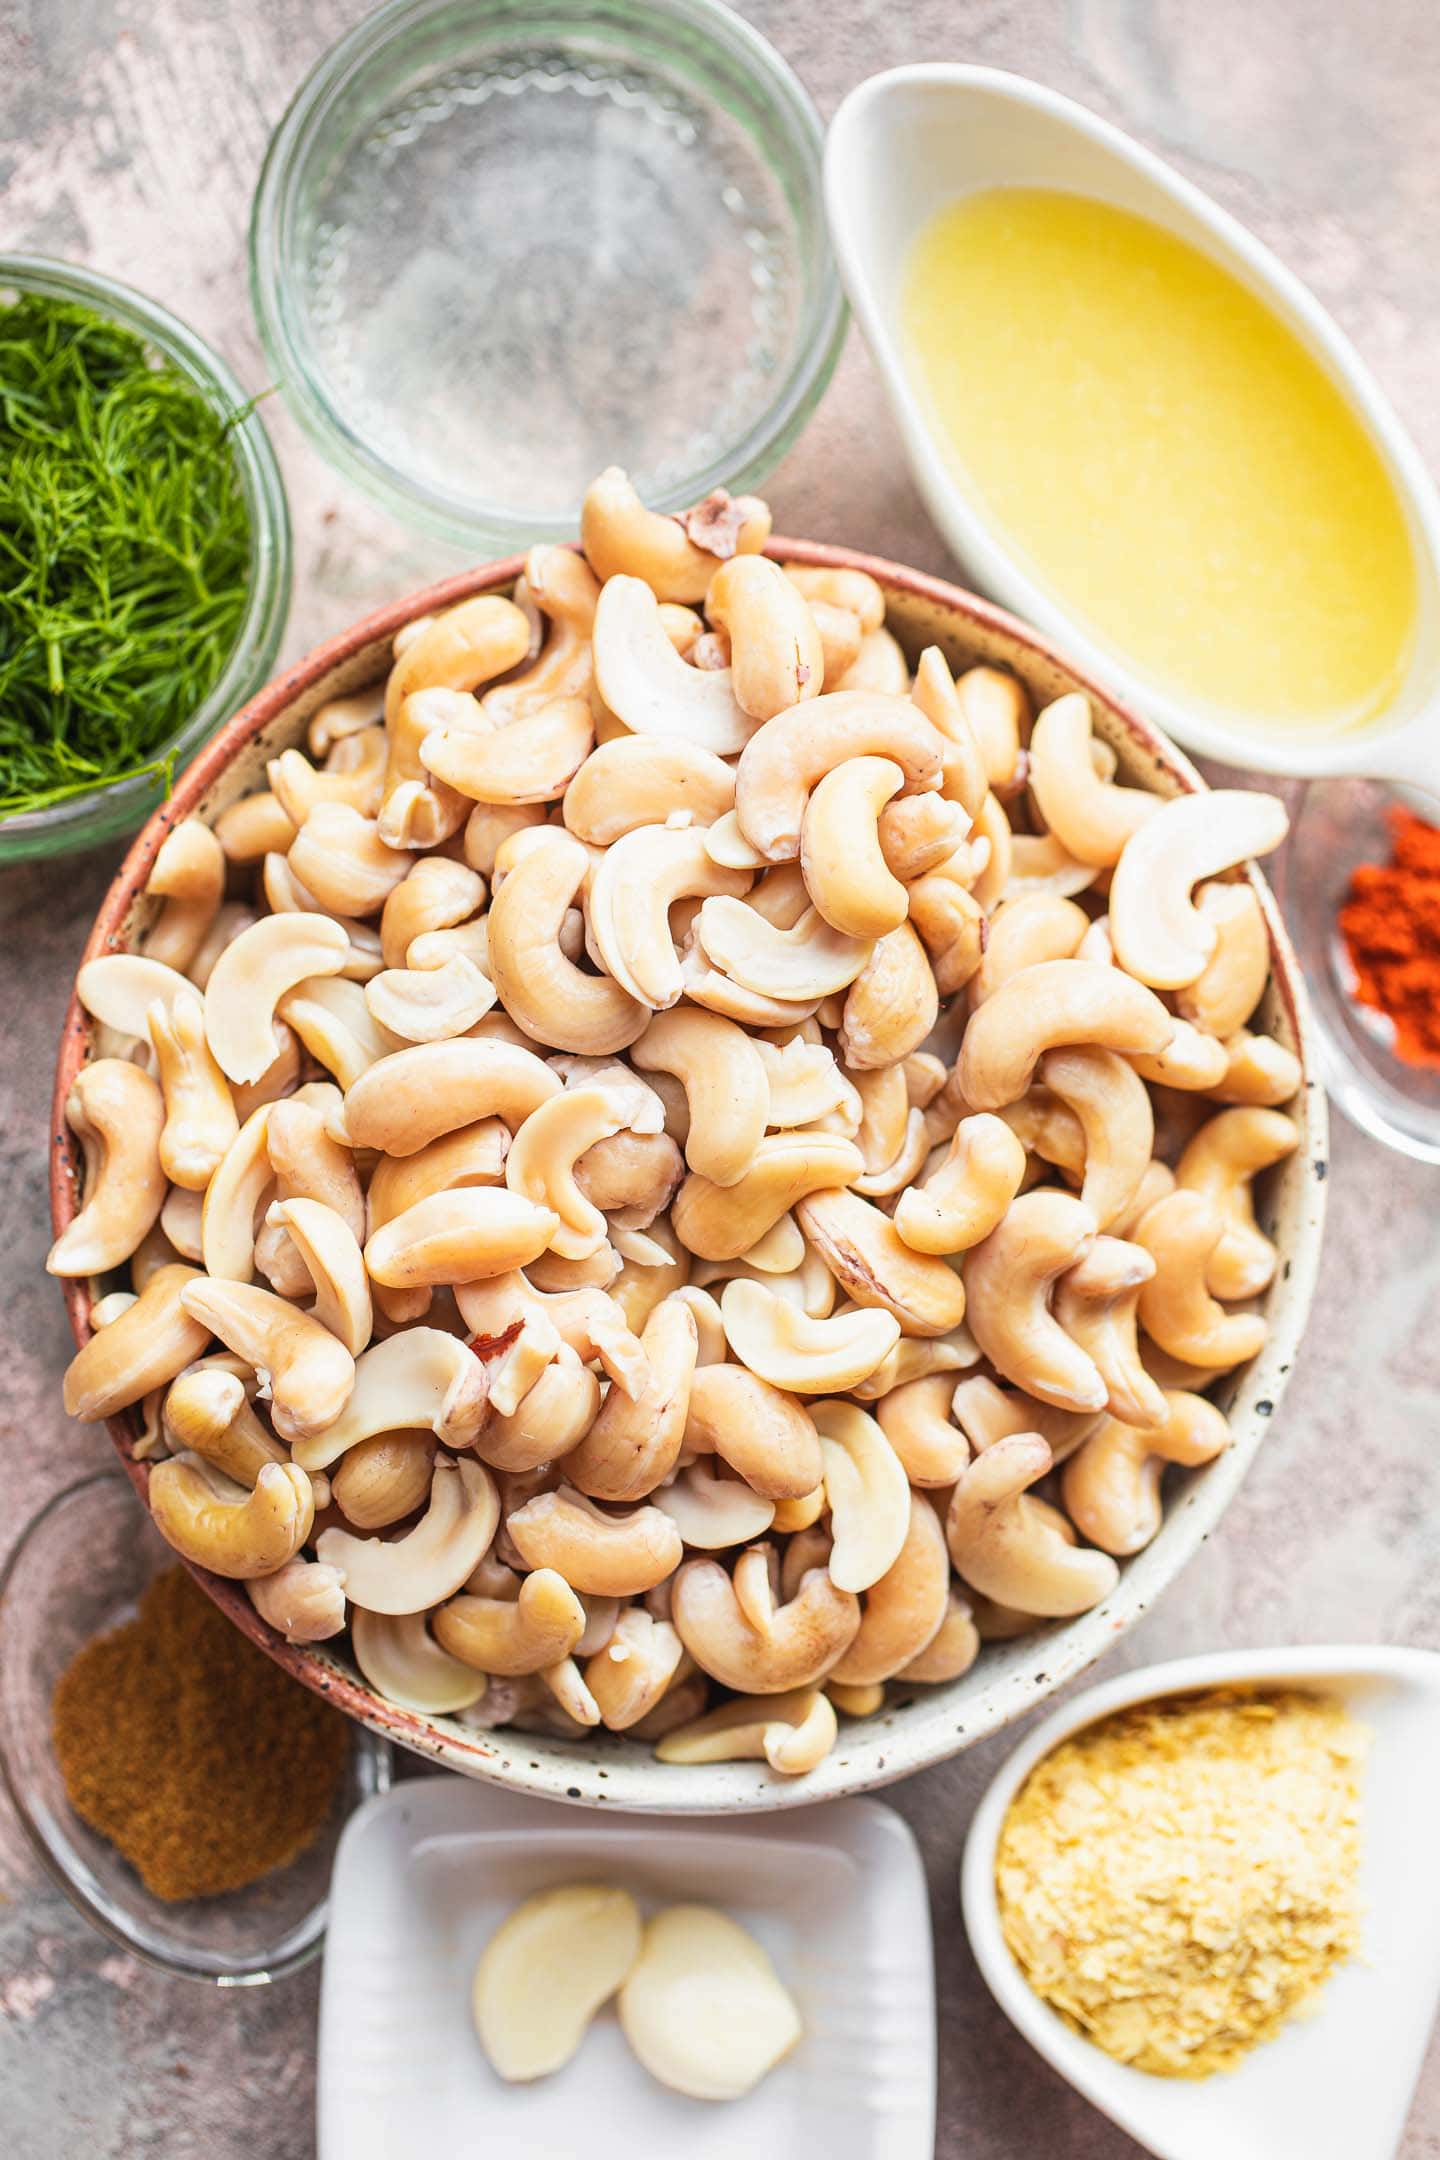 Ingredients for vegan cashew cheese